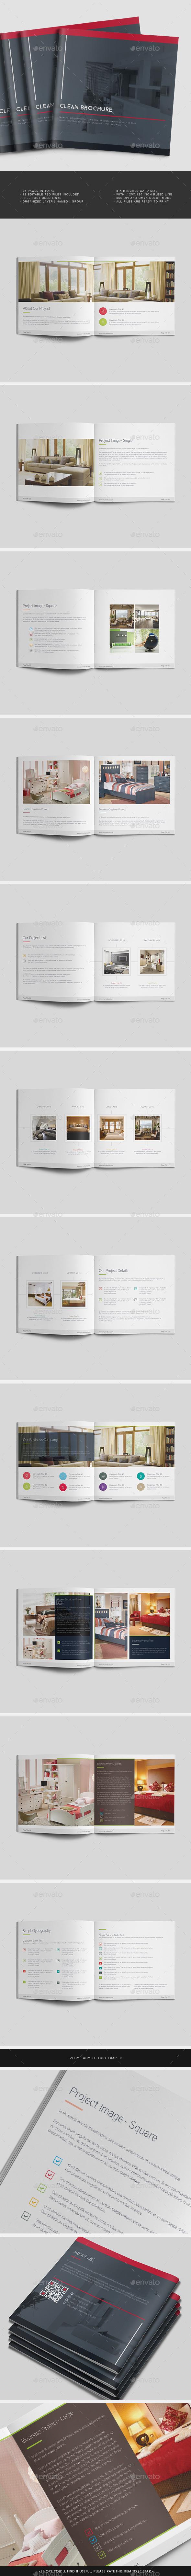 Square Portfolio Brochure V.3 - Portfolio Brochures